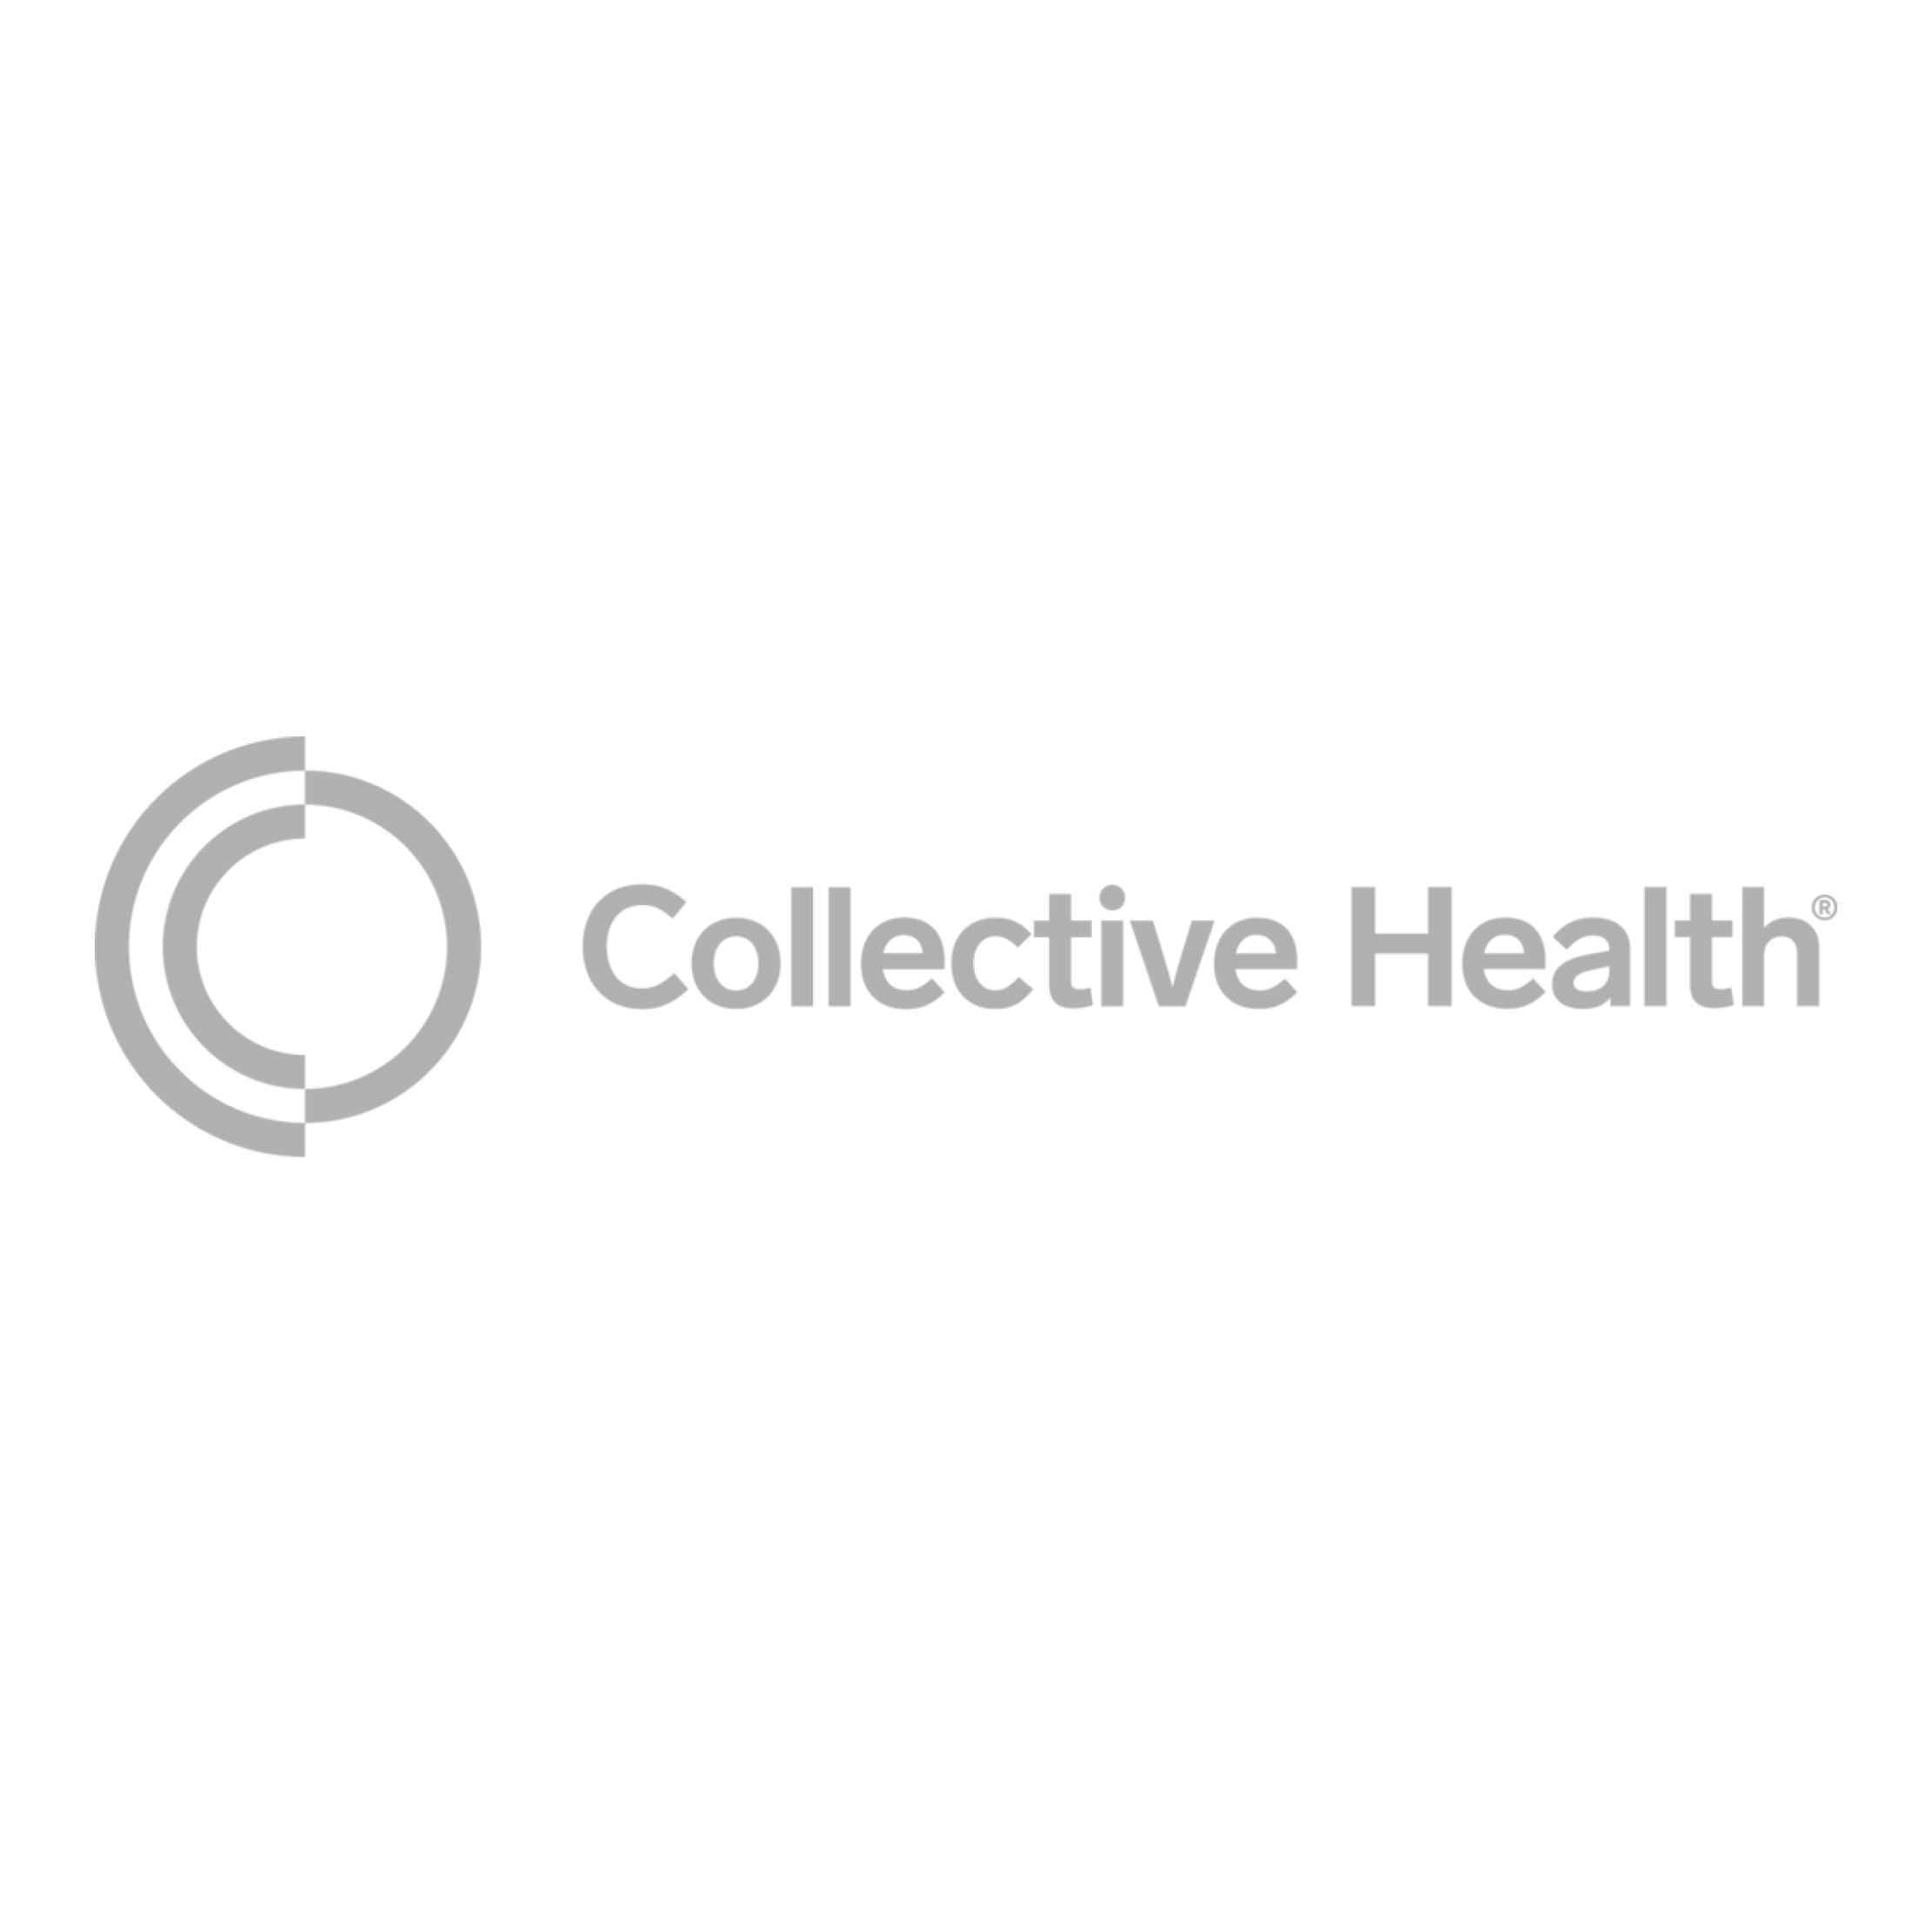 Evolution_Collective_Health_Logo.png